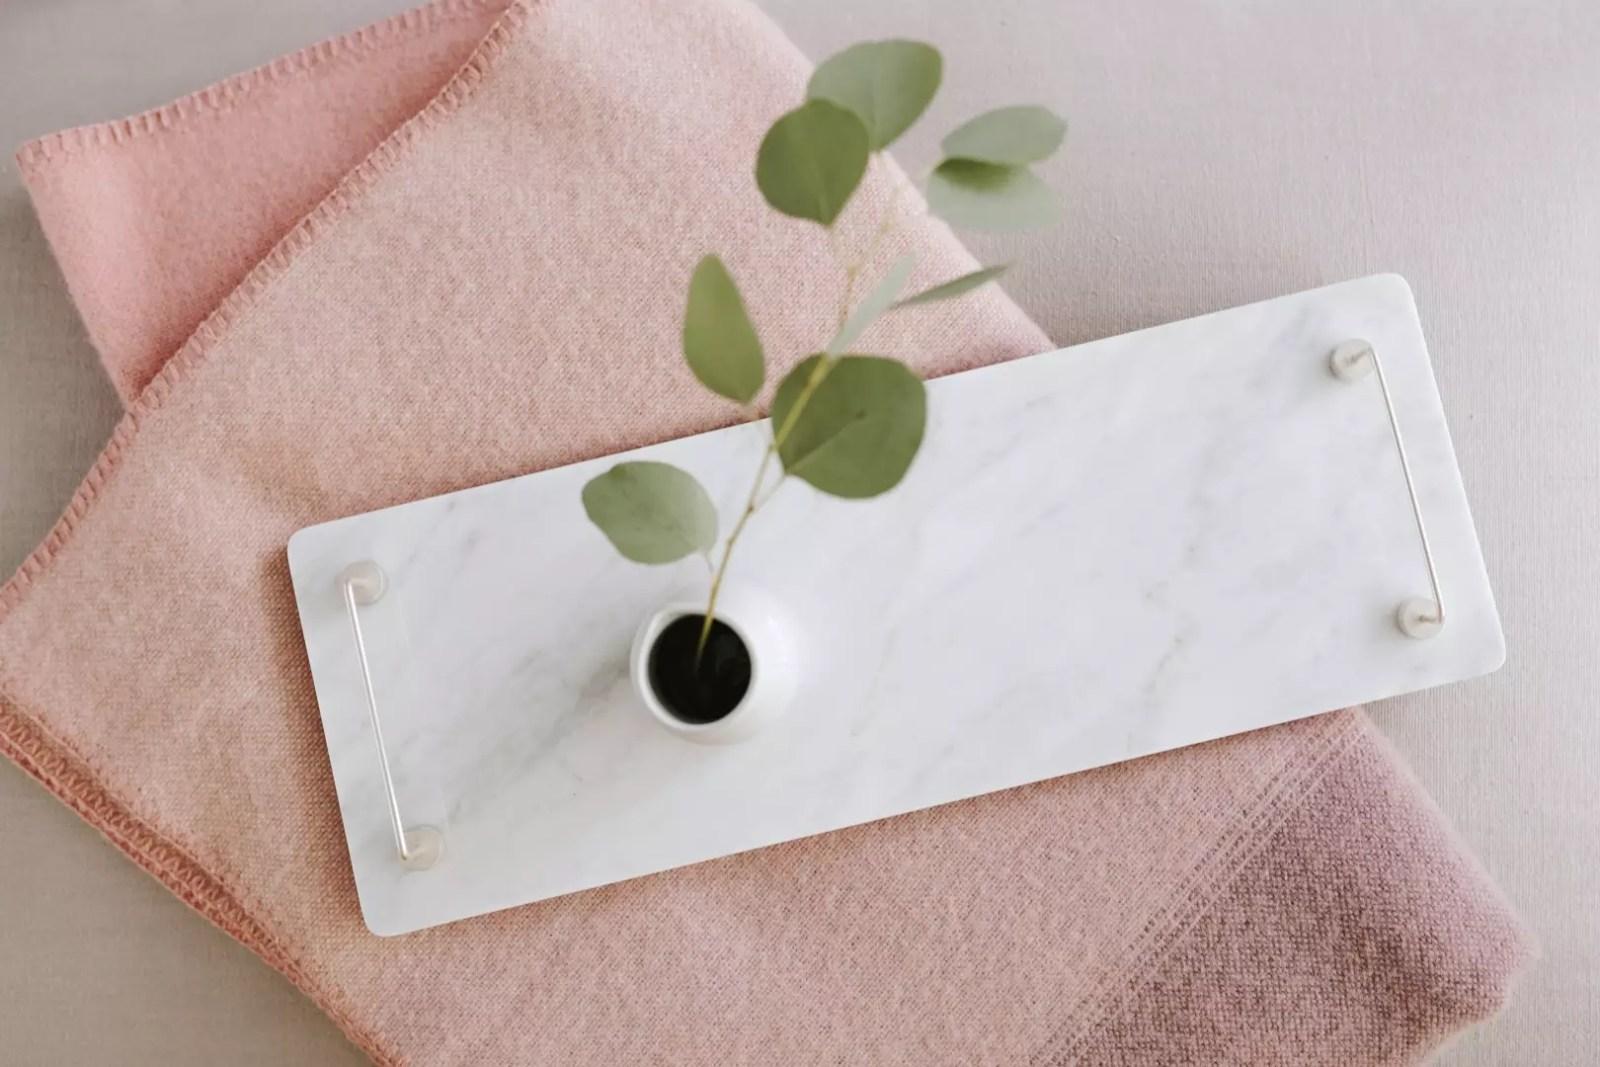 Interieur | 8 styling fouten die je huis rommelig maken - Woonblog StijlvolStyling.com